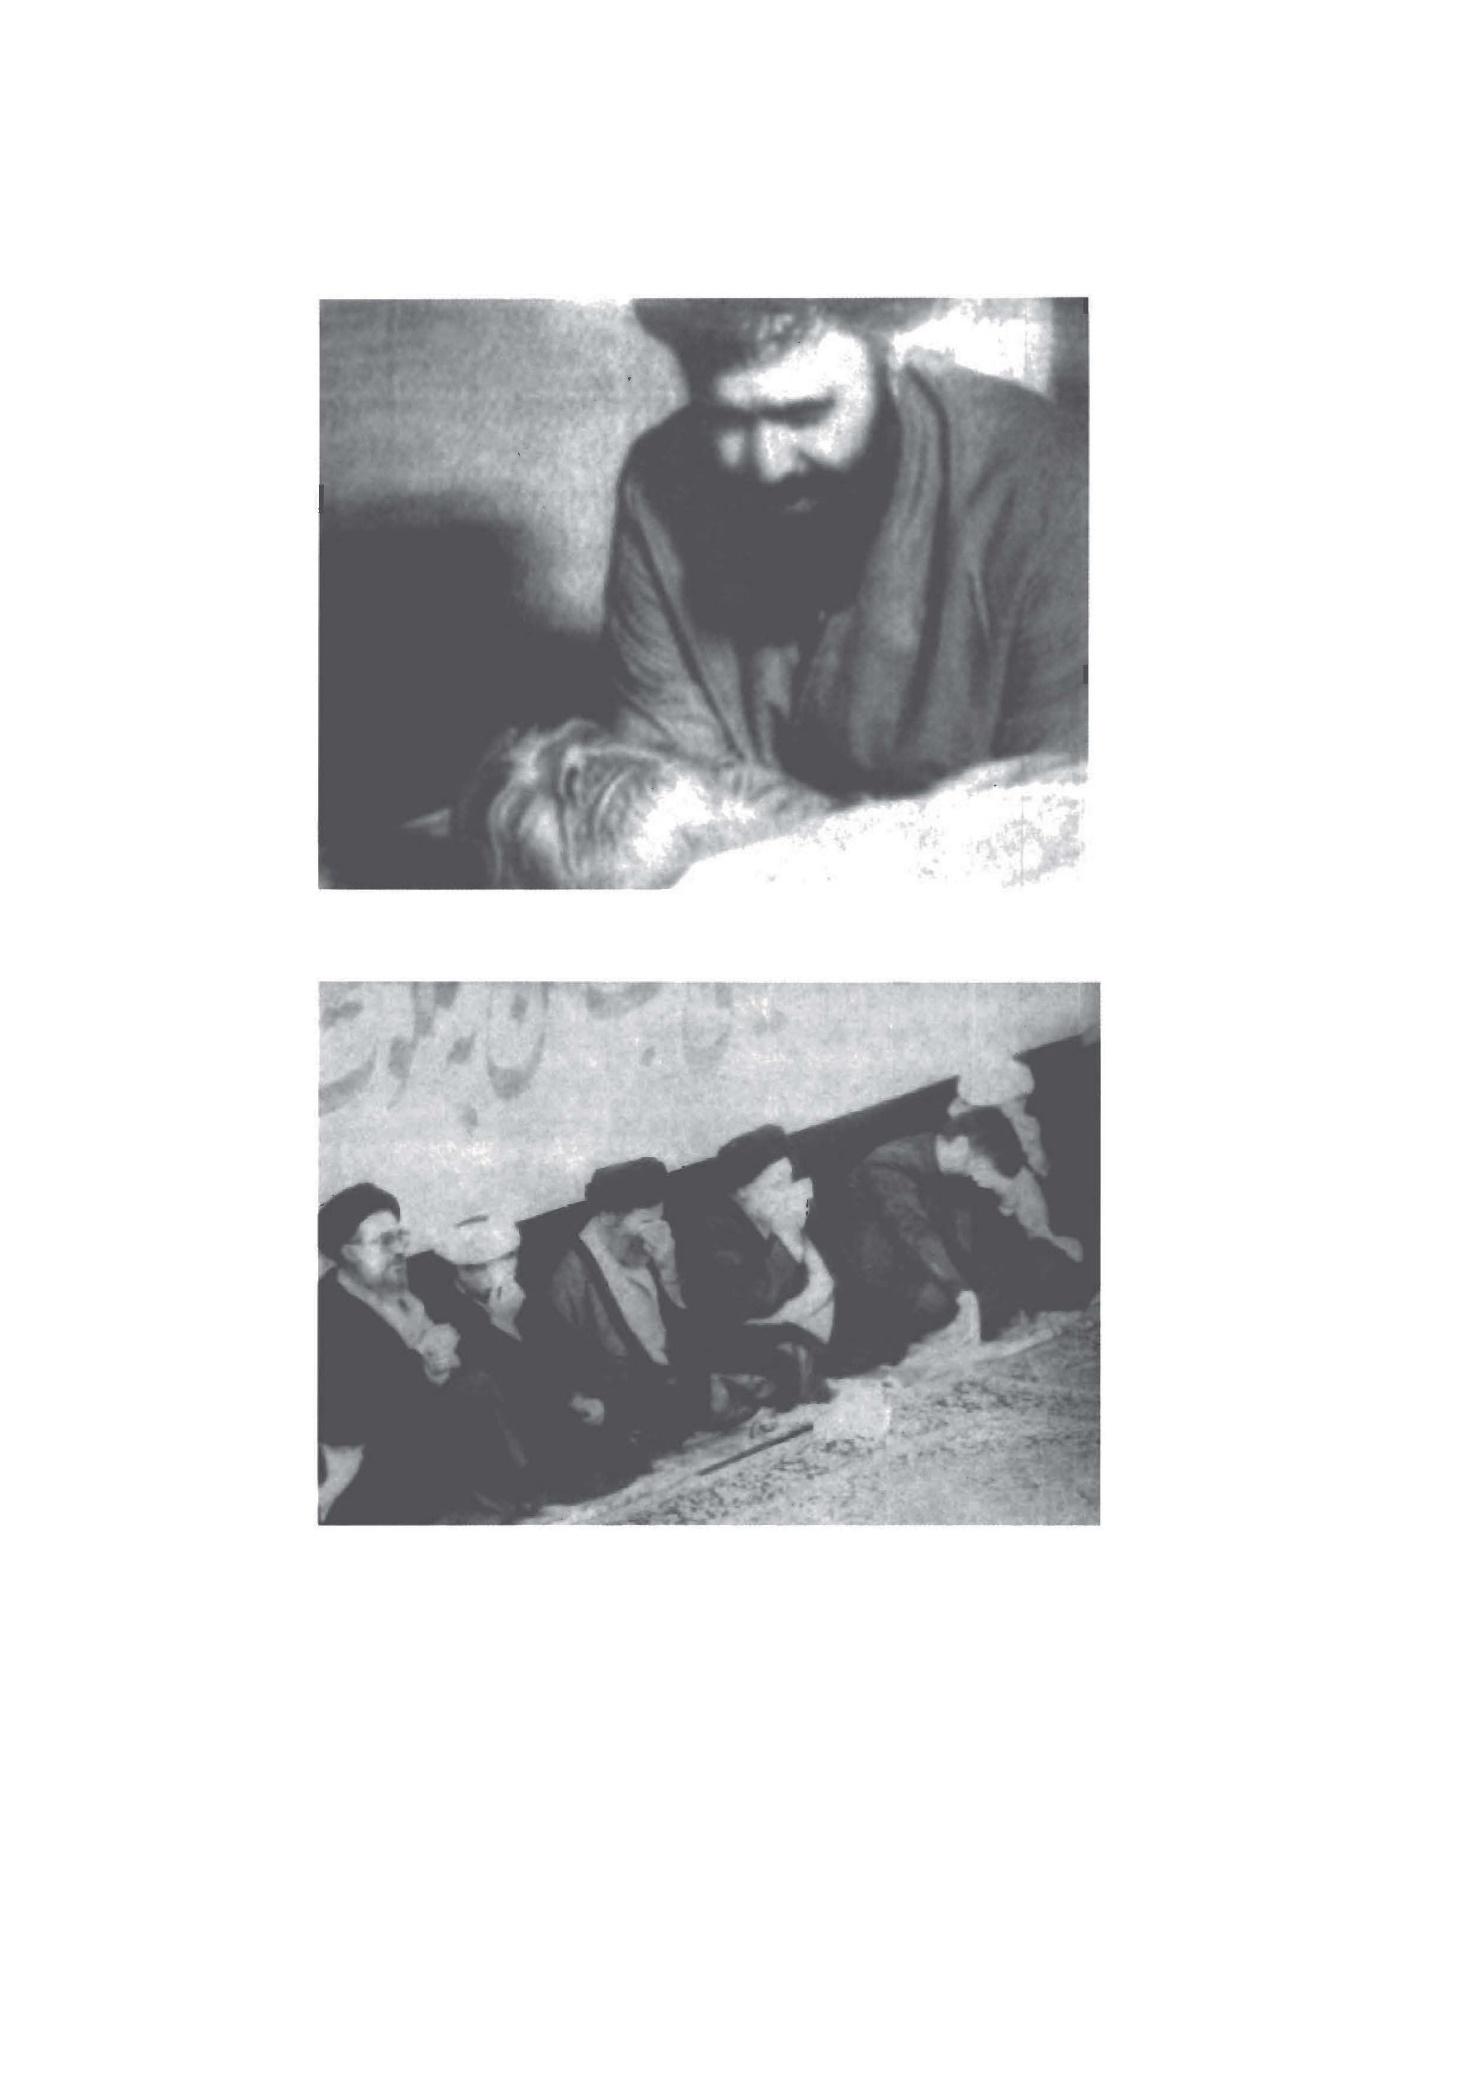 F:\f.khosravi\خاطرات\خاطرات فایل اصلی\150-fasle-sabr-kha-3-per\Pages from 150-Fasl sabr-khaterati az iyyame bimari -a4_Page_5.jpg